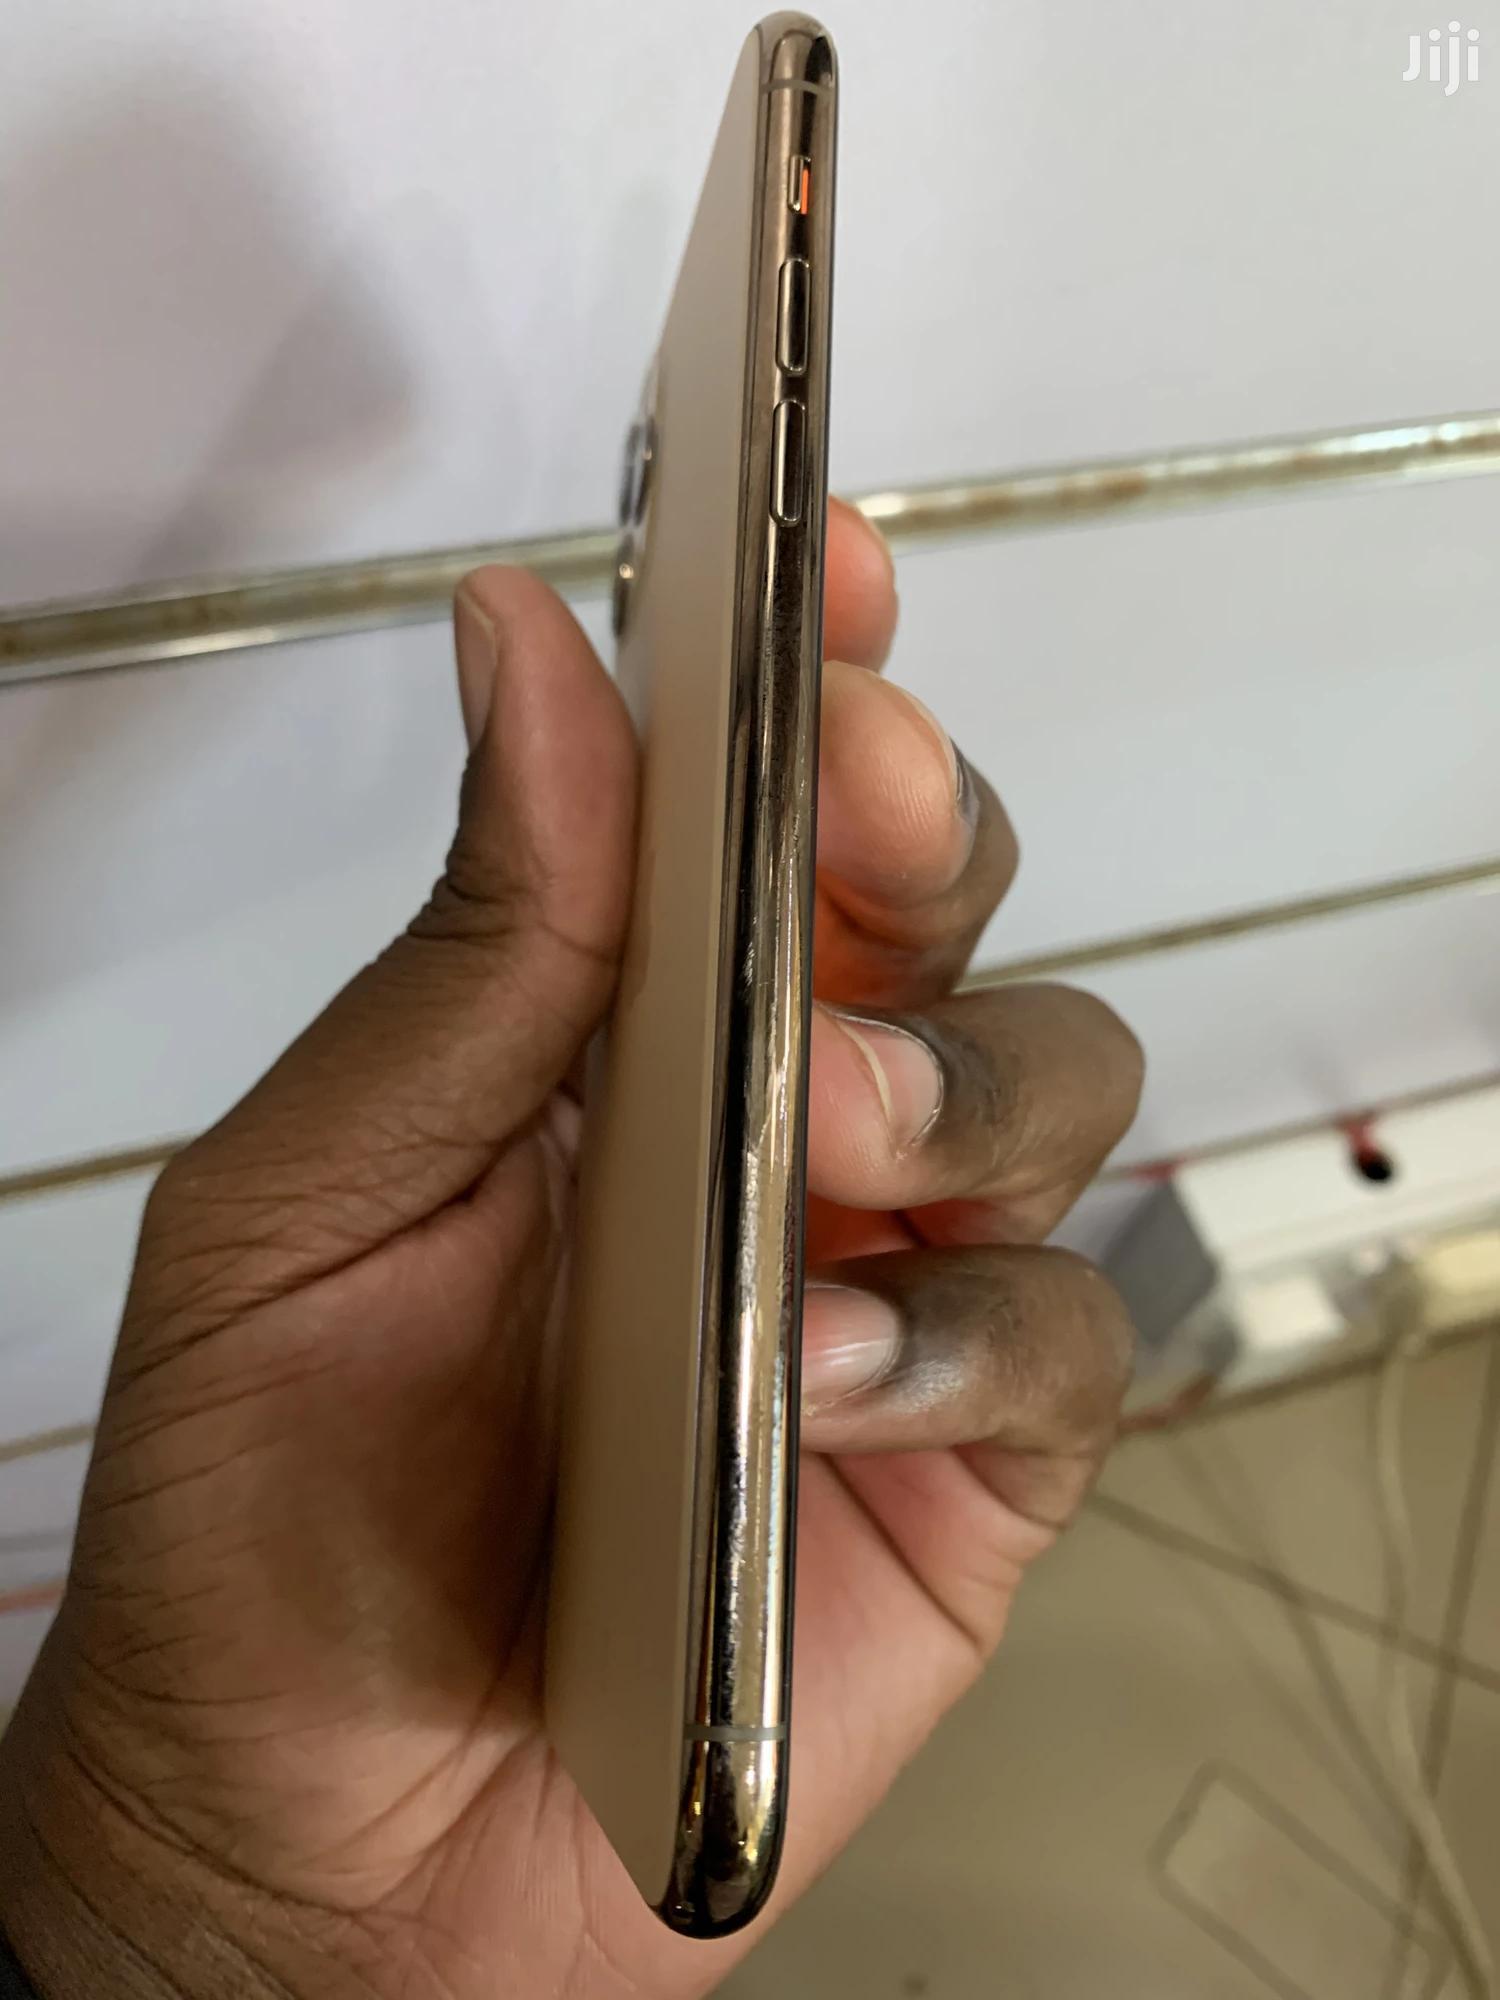 Apple iPhone 11 Pro Max 512 GB Gold   Mobile Phones for sale in Kampala, Central Region, Uganda